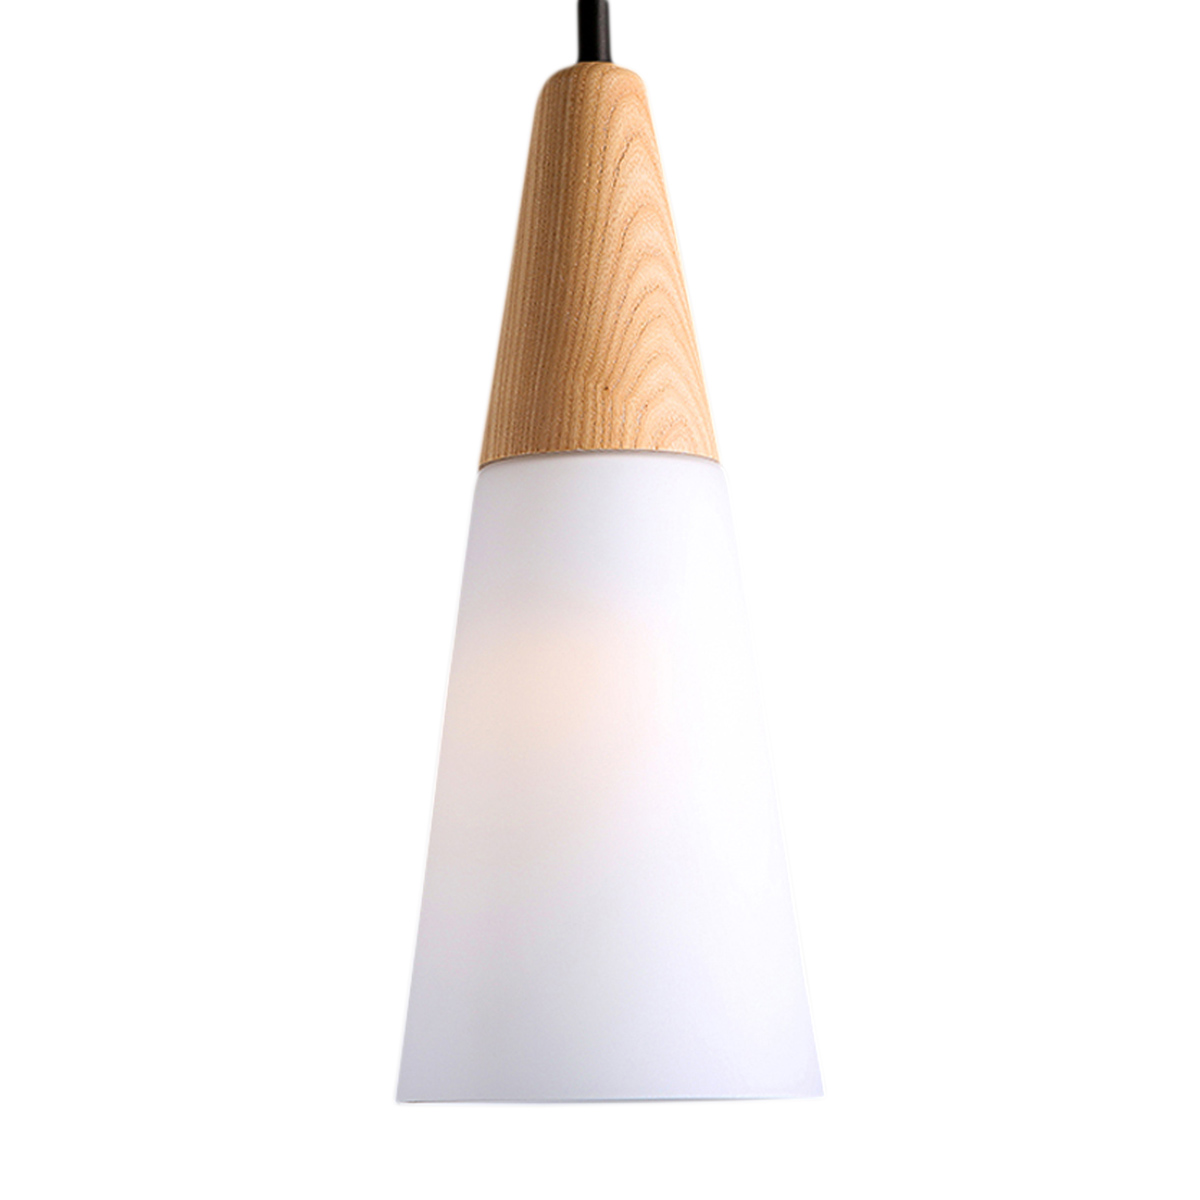 Japan lampen werbeaktion shop f r werbeaktion japan lampen for Lampen japan